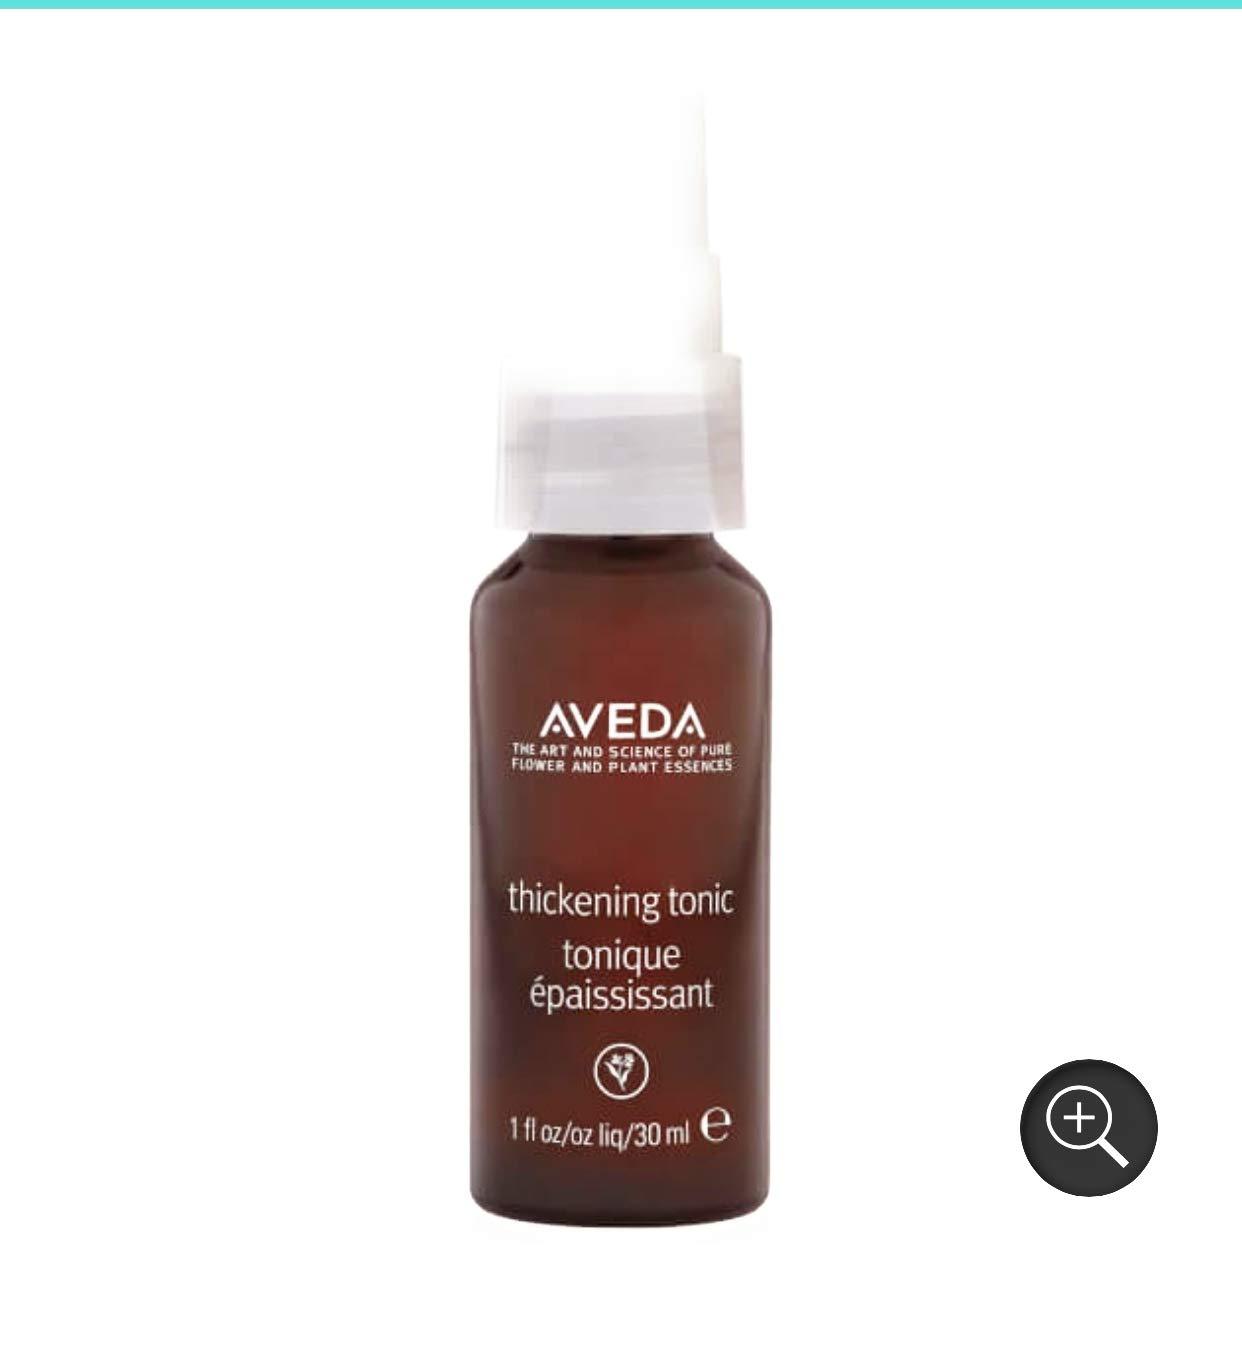 Aveda Thickening Tonic Travel Size 30ml